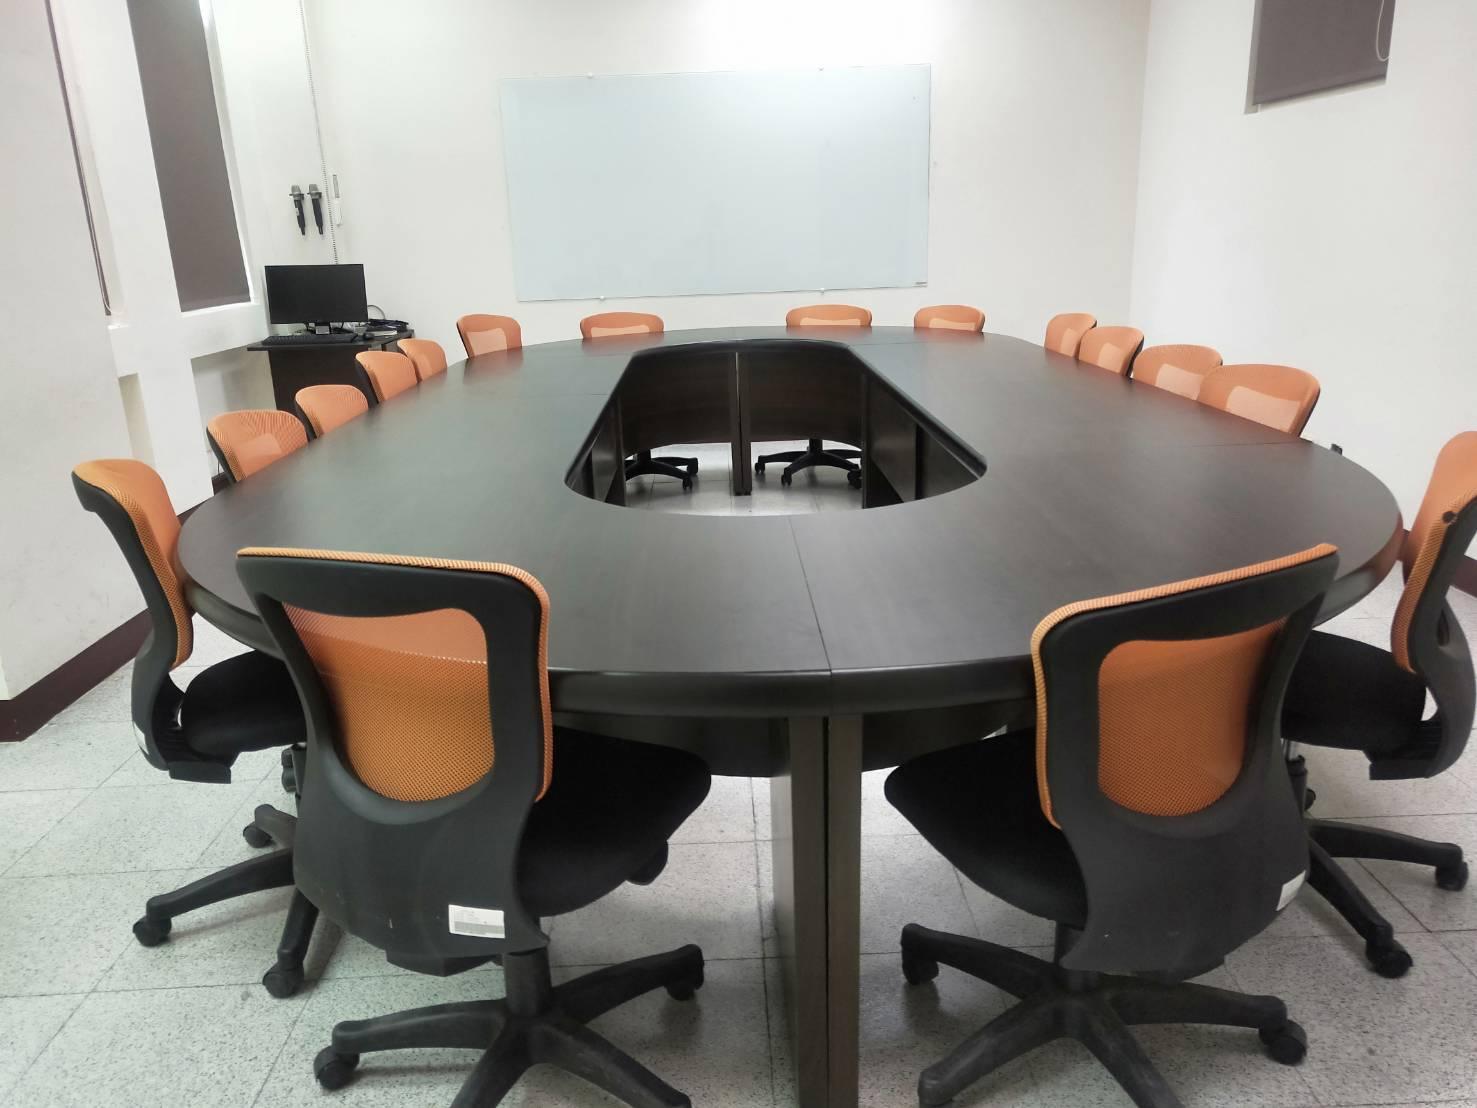 ACM Maker's Classroom, room M614